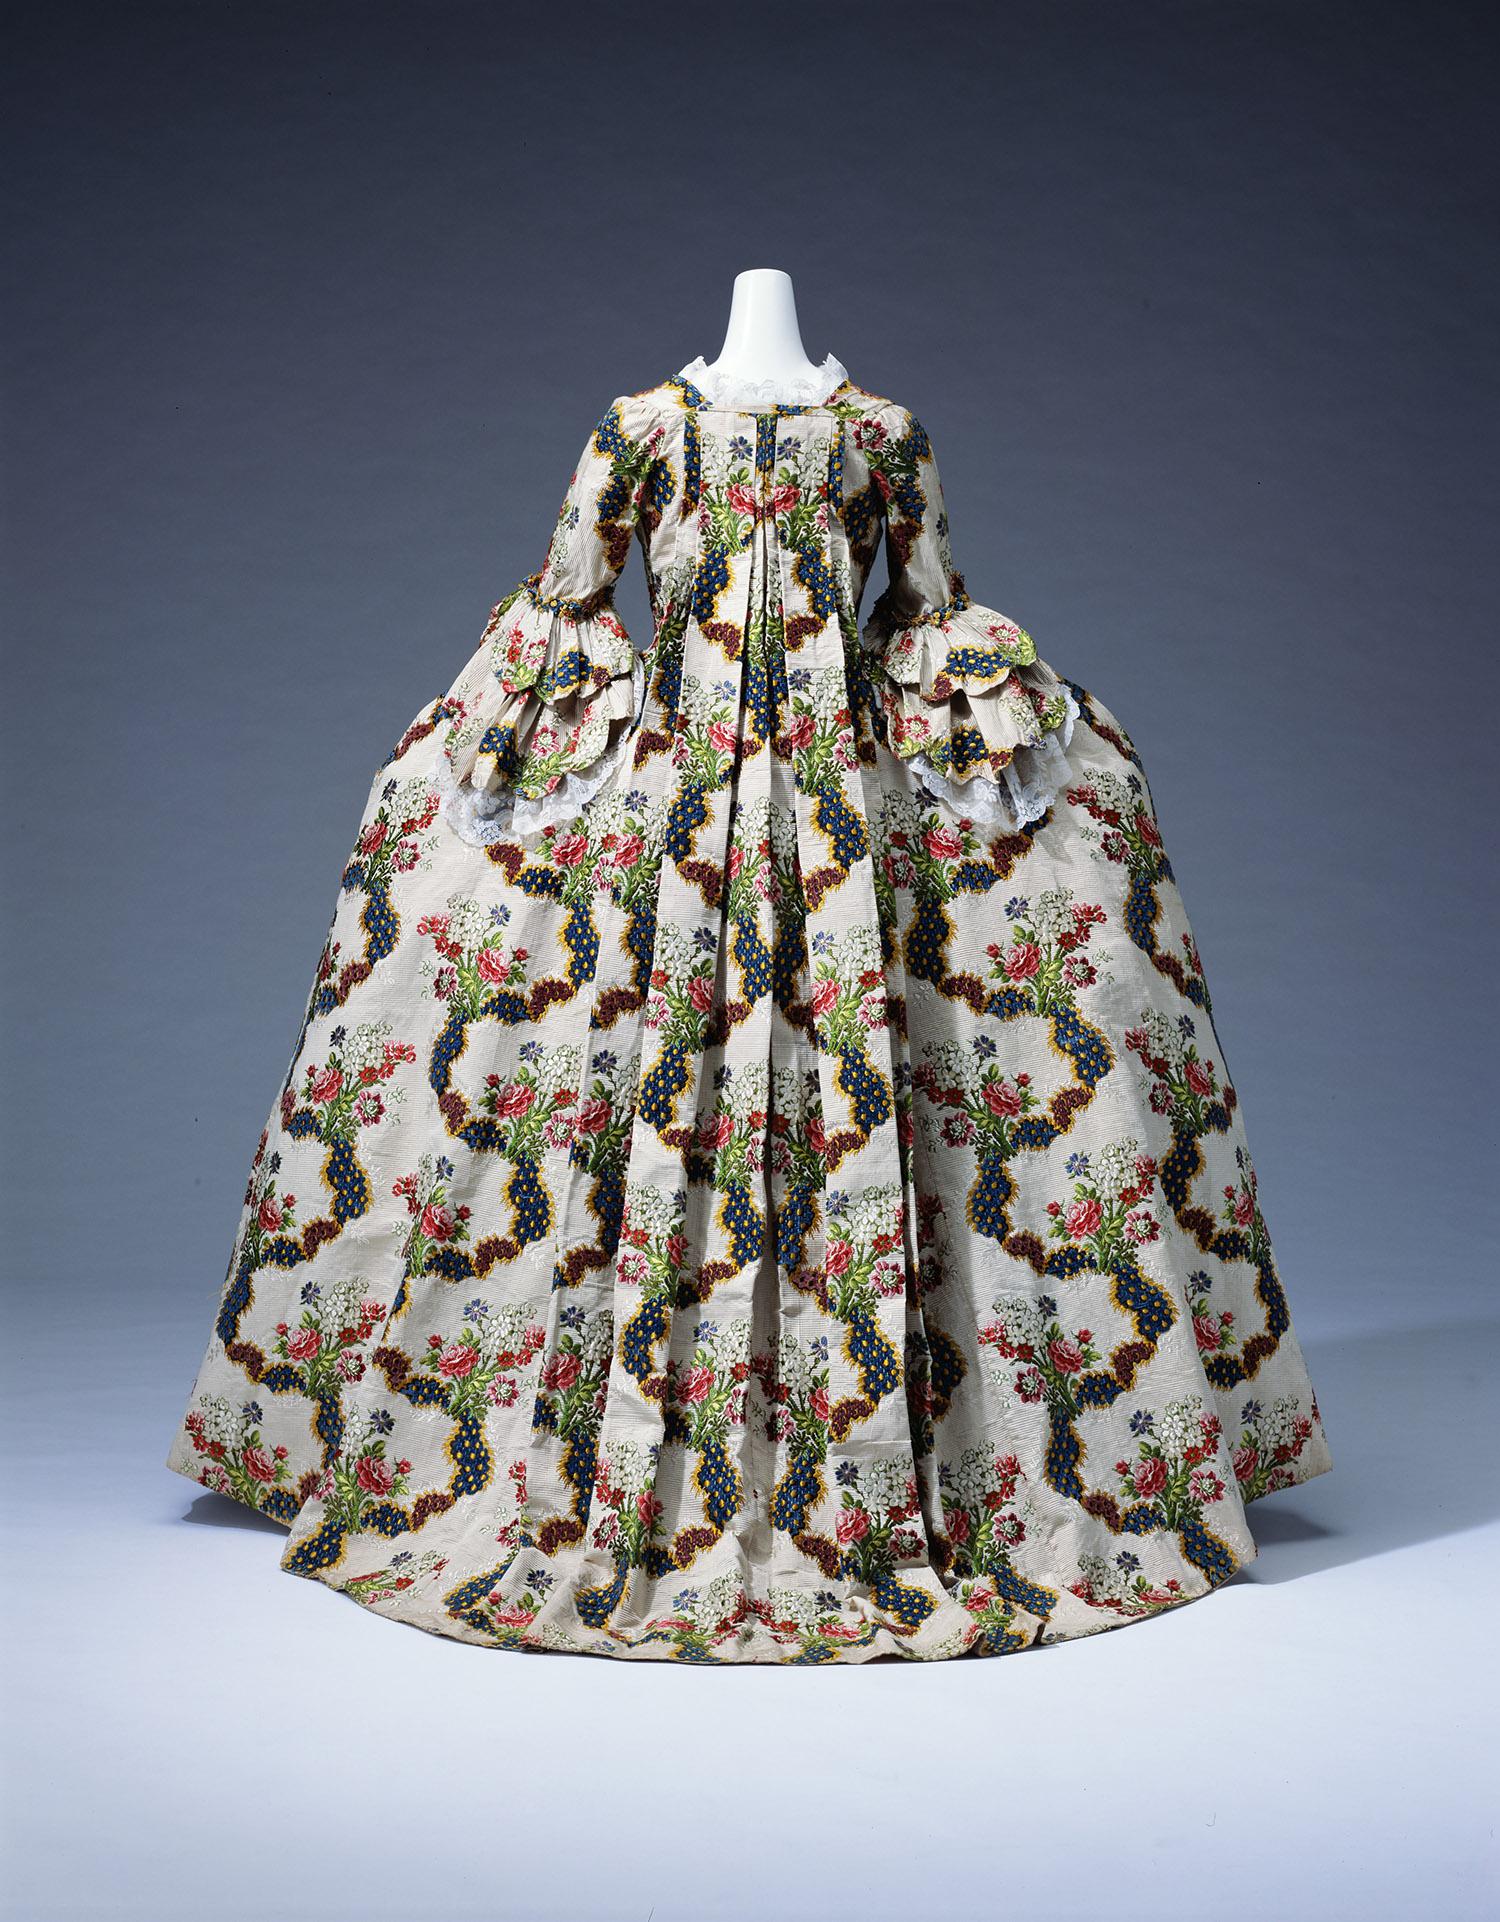 Dress (grande robe a la francaise)_300dpi